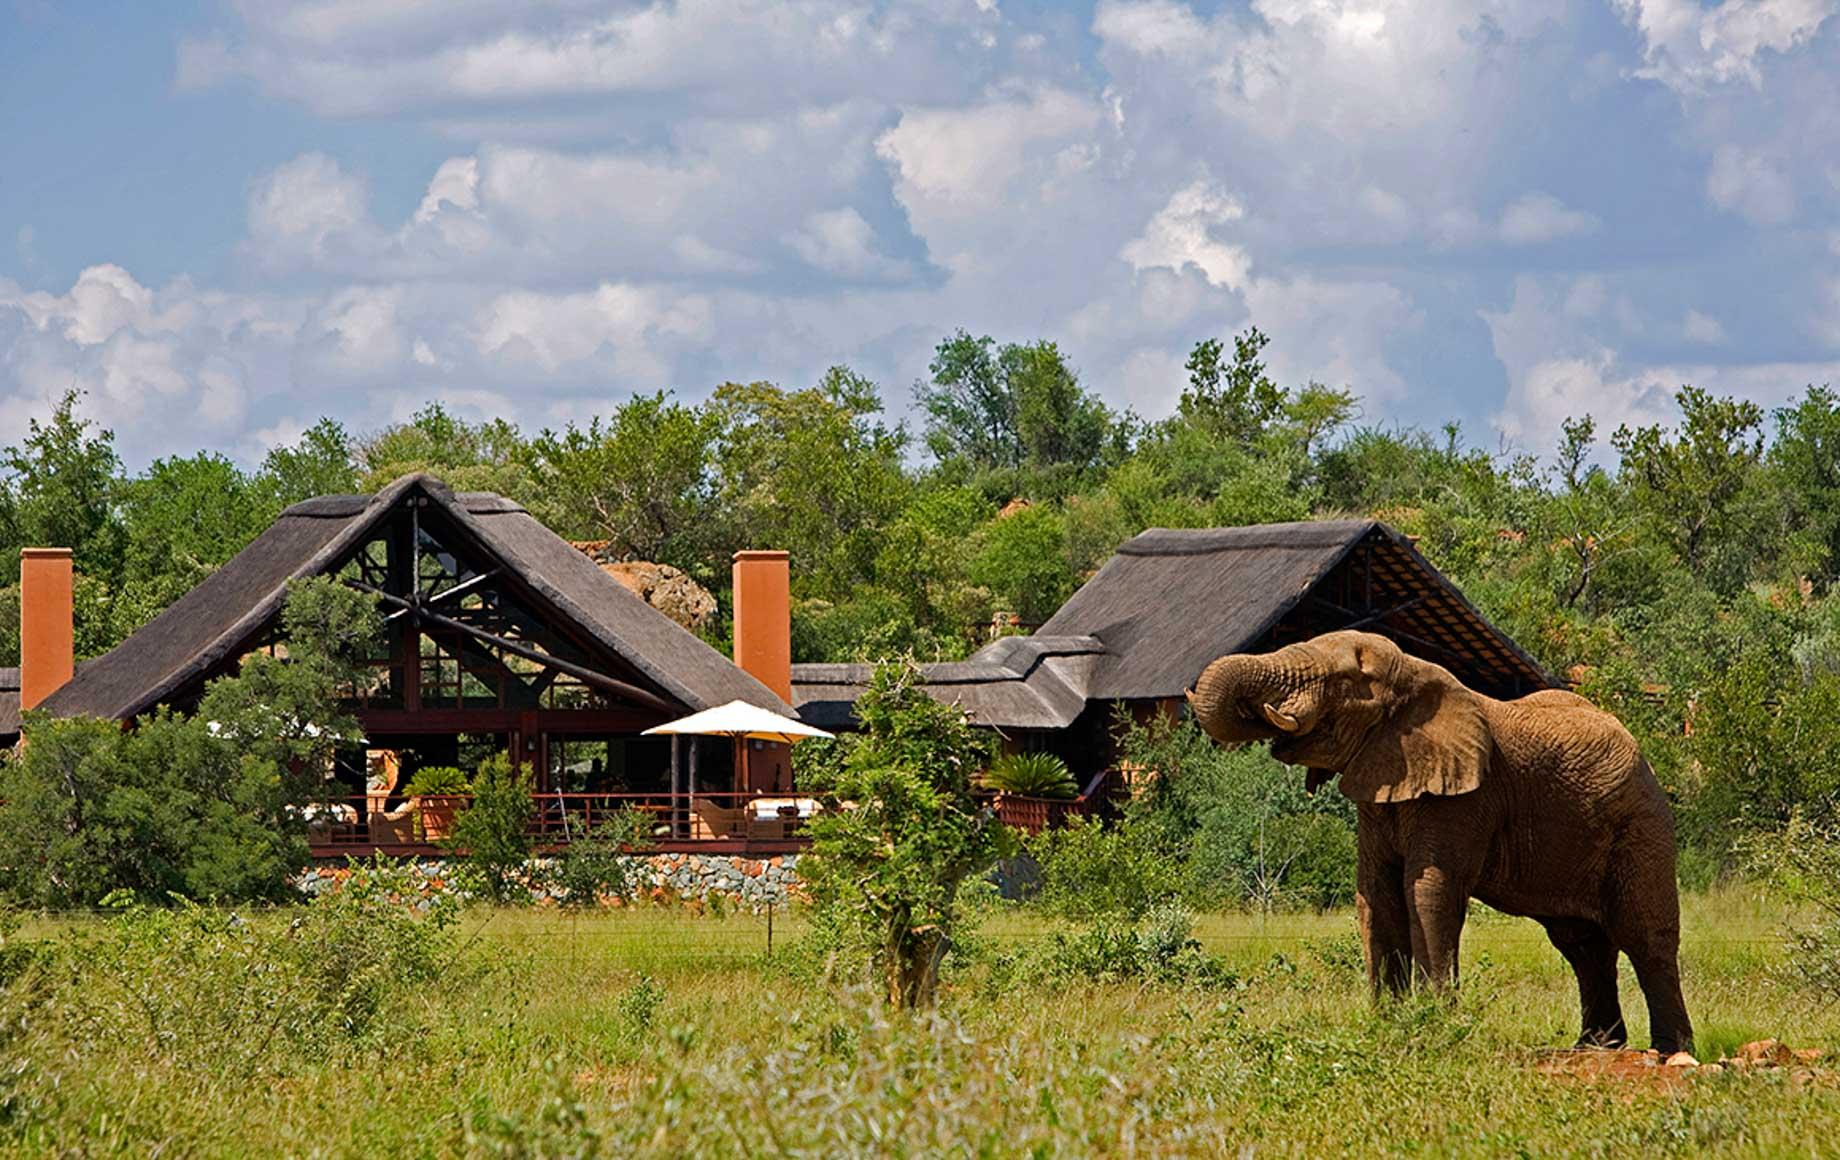 Elephant at Madikwe Game Reserve